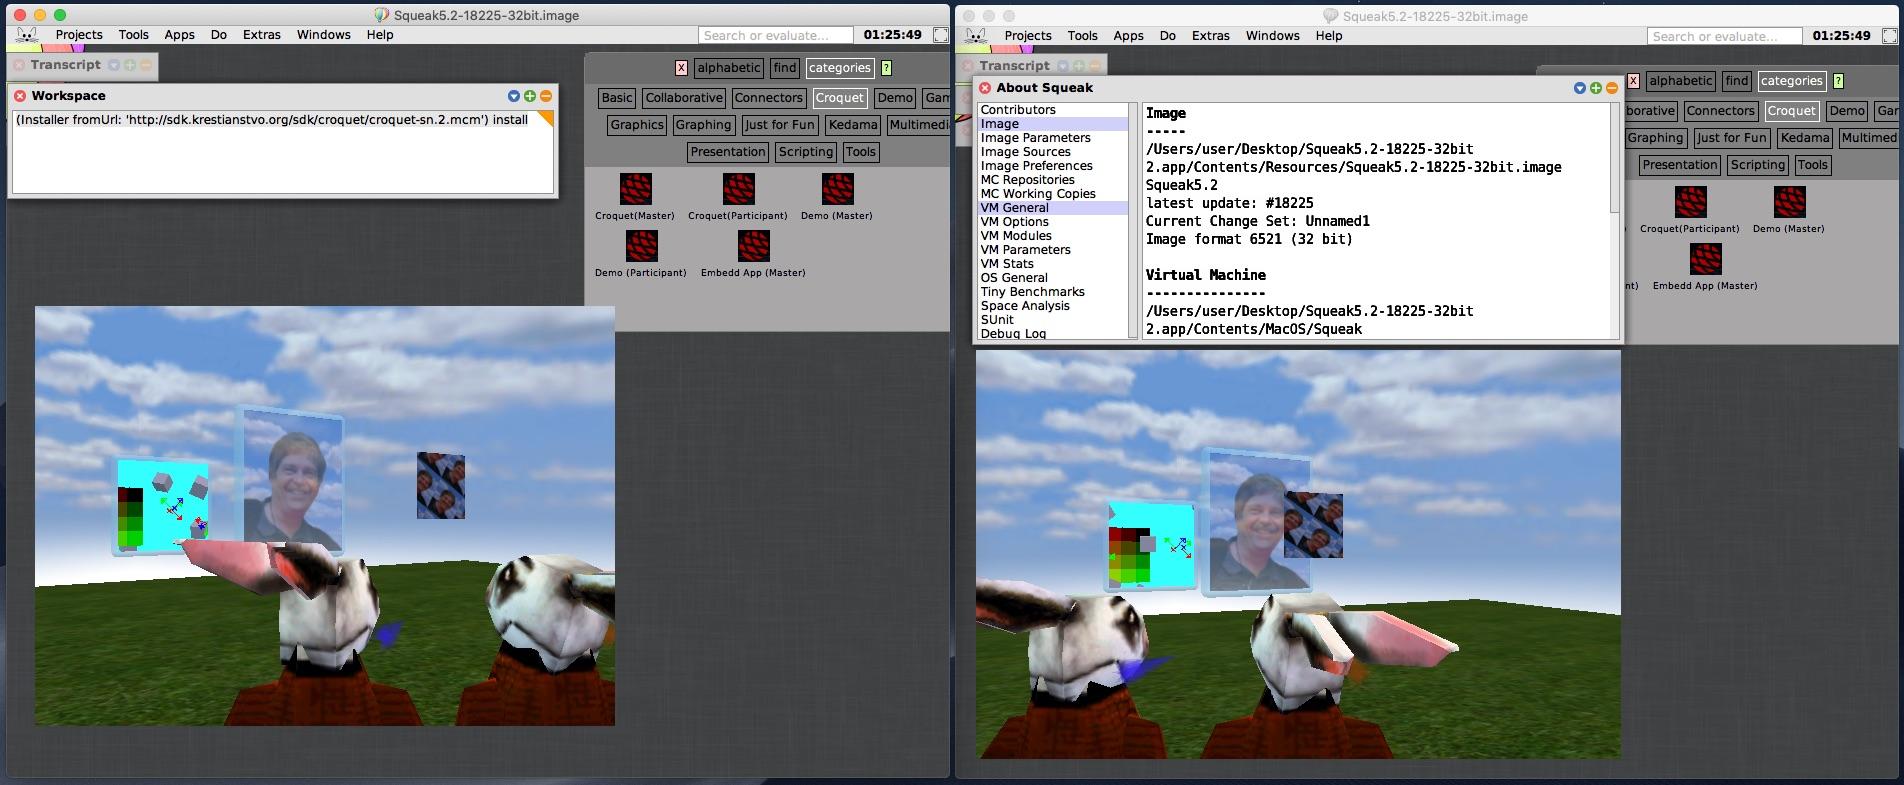 Croquet-for-Squeak-5.2.jpg